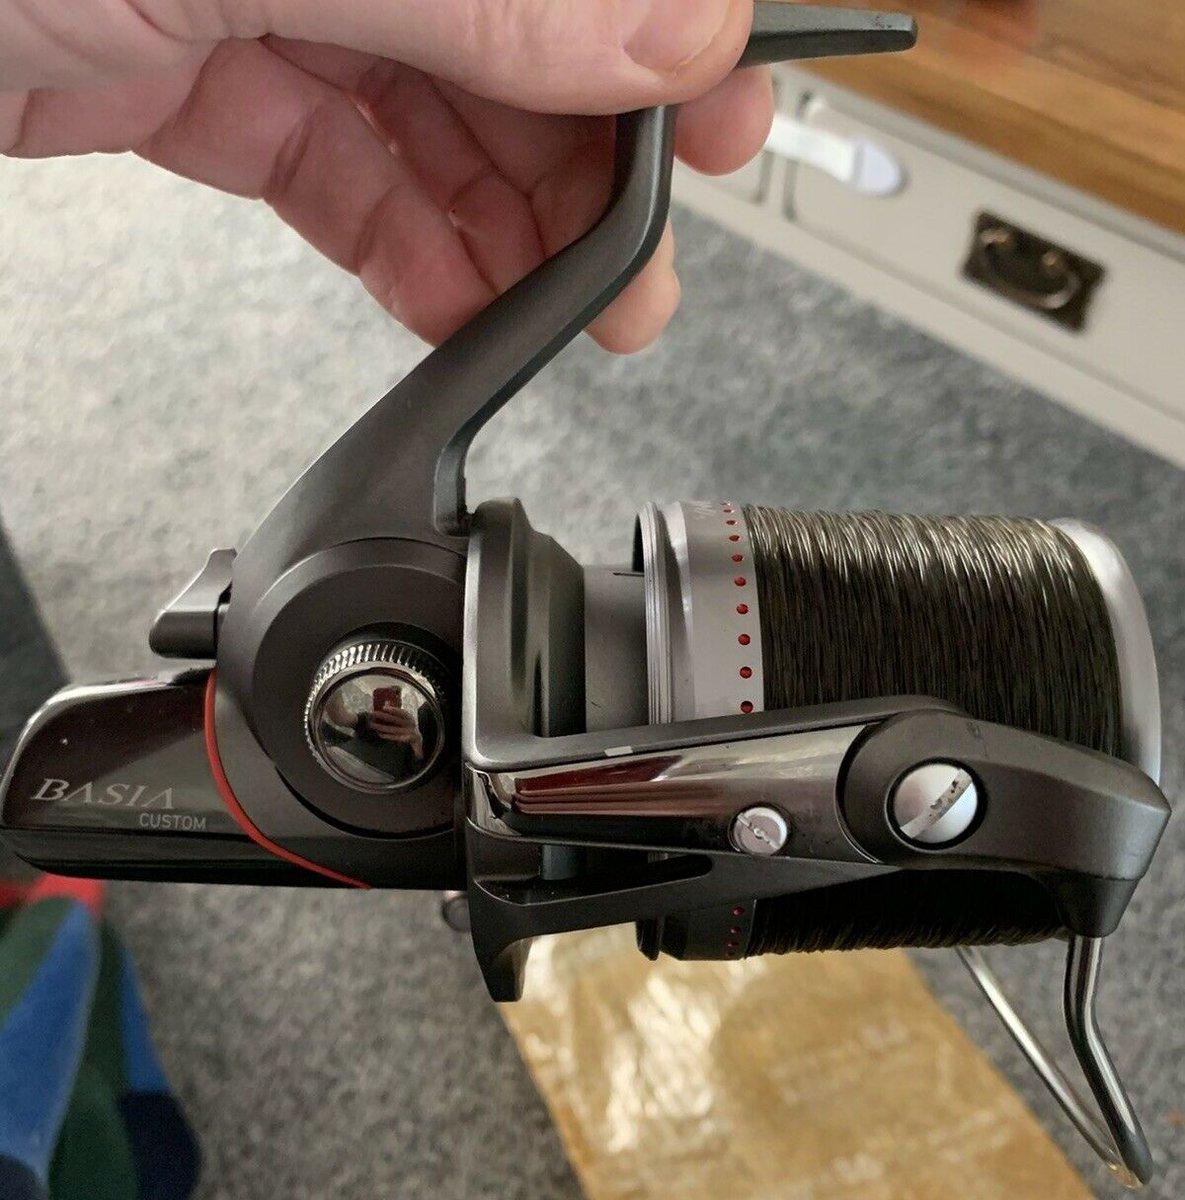 Ad - Daiwa Basia QD Custom Reels x3 On eBay here -->> https://t.co/KaW6DO7wl3  #carpfishing ht